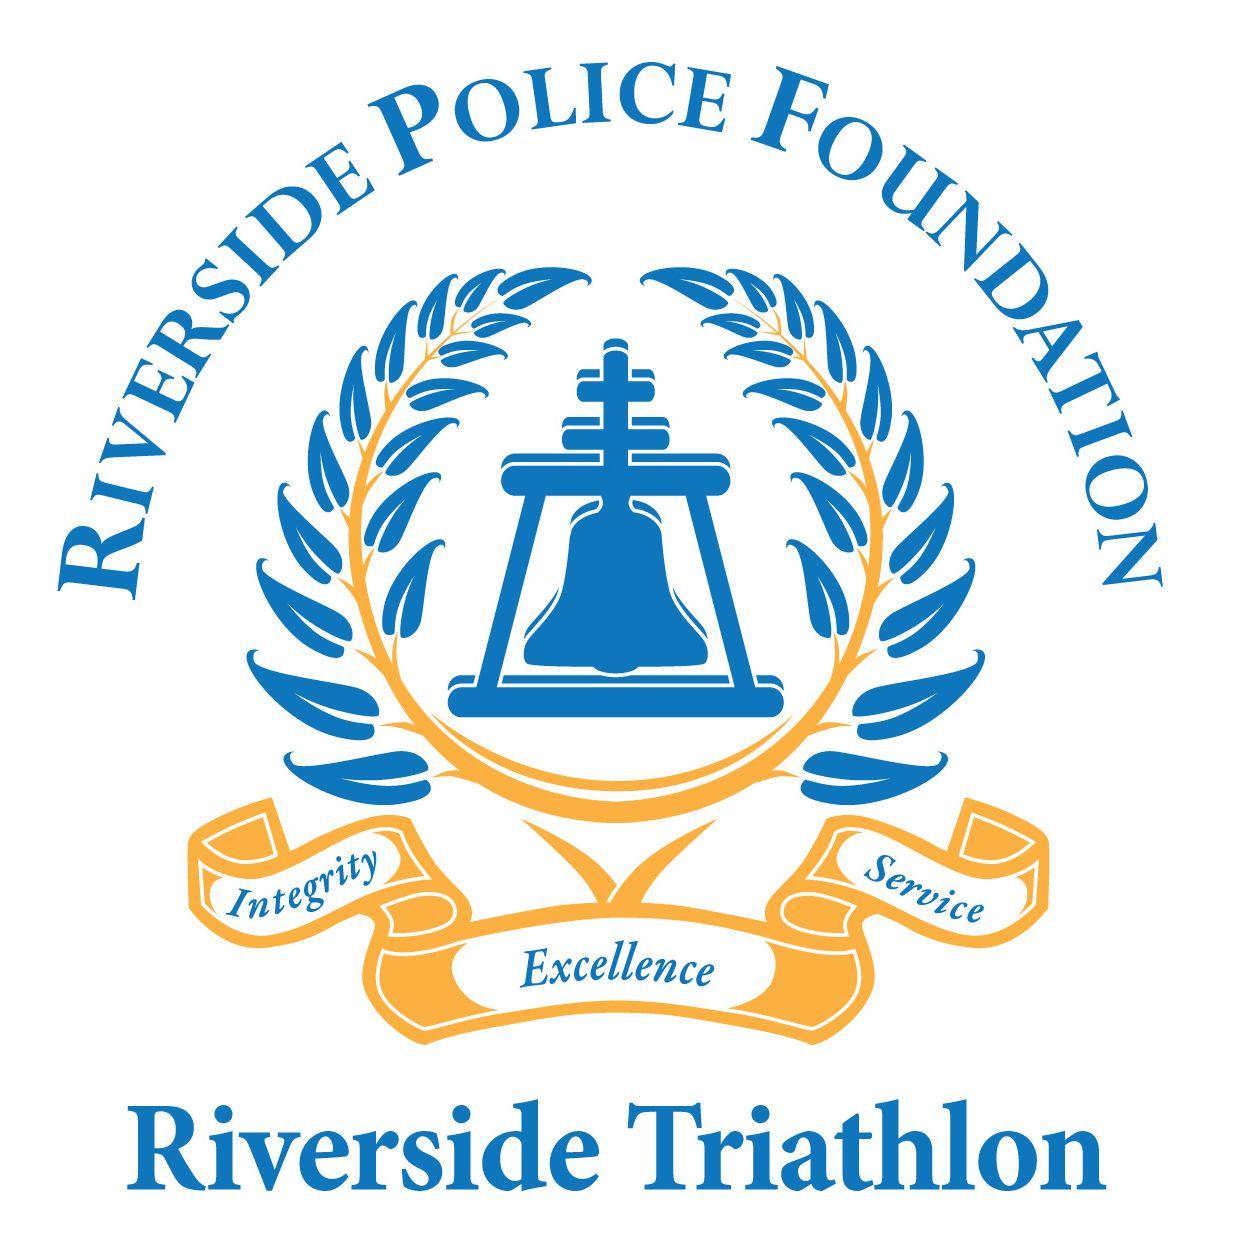 Riverside triathlon triathlon riverside triathlon race